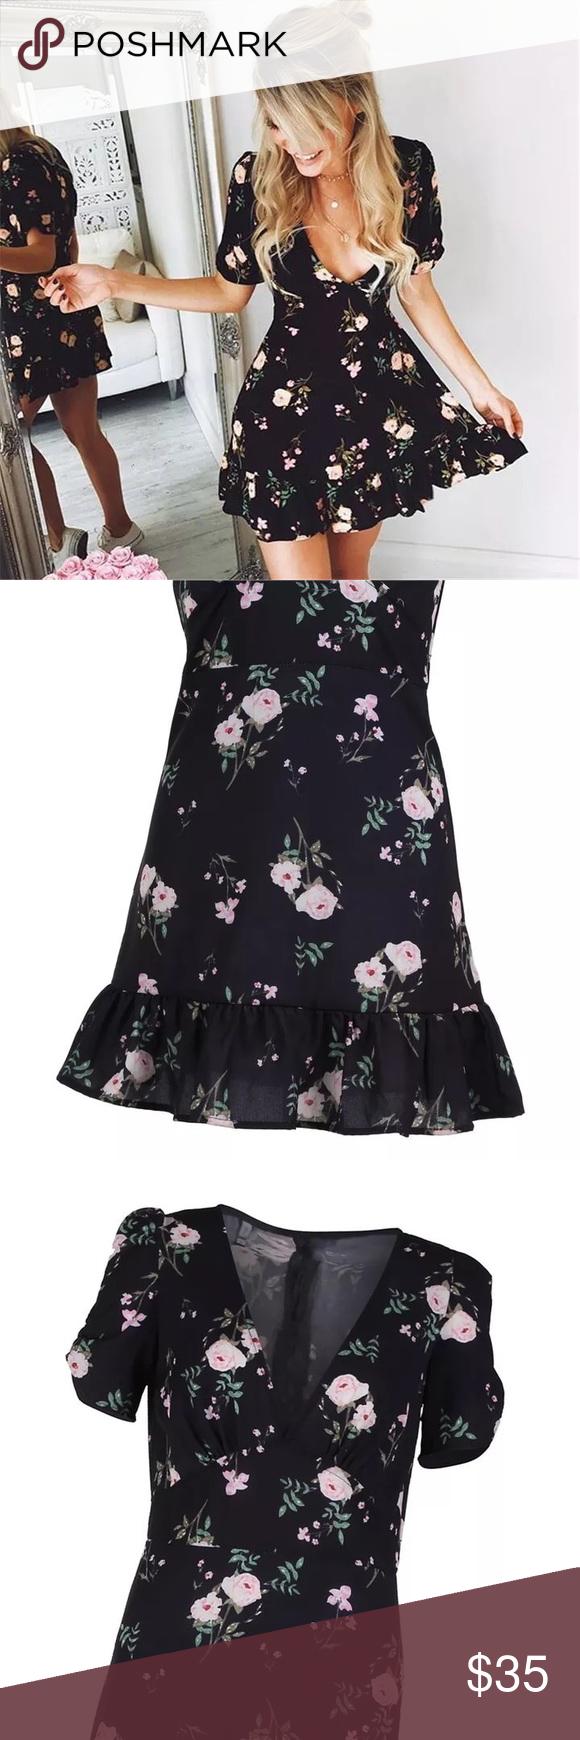 Nwt Black Floral V Neck Dress W White Flowers Clothes Design Dresses V Neck Dress [ 1740 x 580 Pixel ]